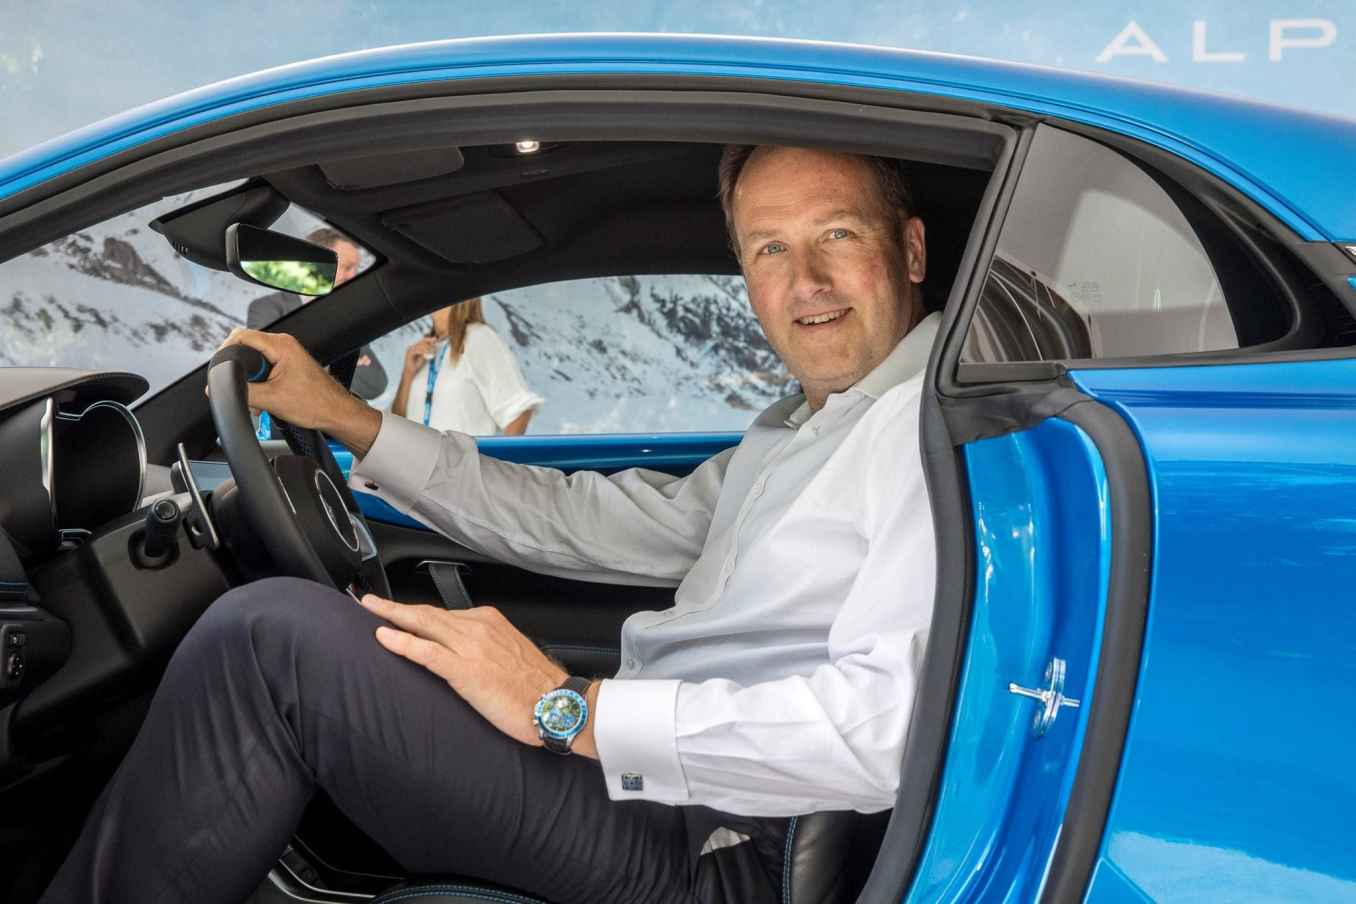 Alpine A110 2017 Mickael van der sande Parco Valentino Salone dellAuto di Torino 11 | Alpine prépare l'avenir et fait évoluer son organigramme